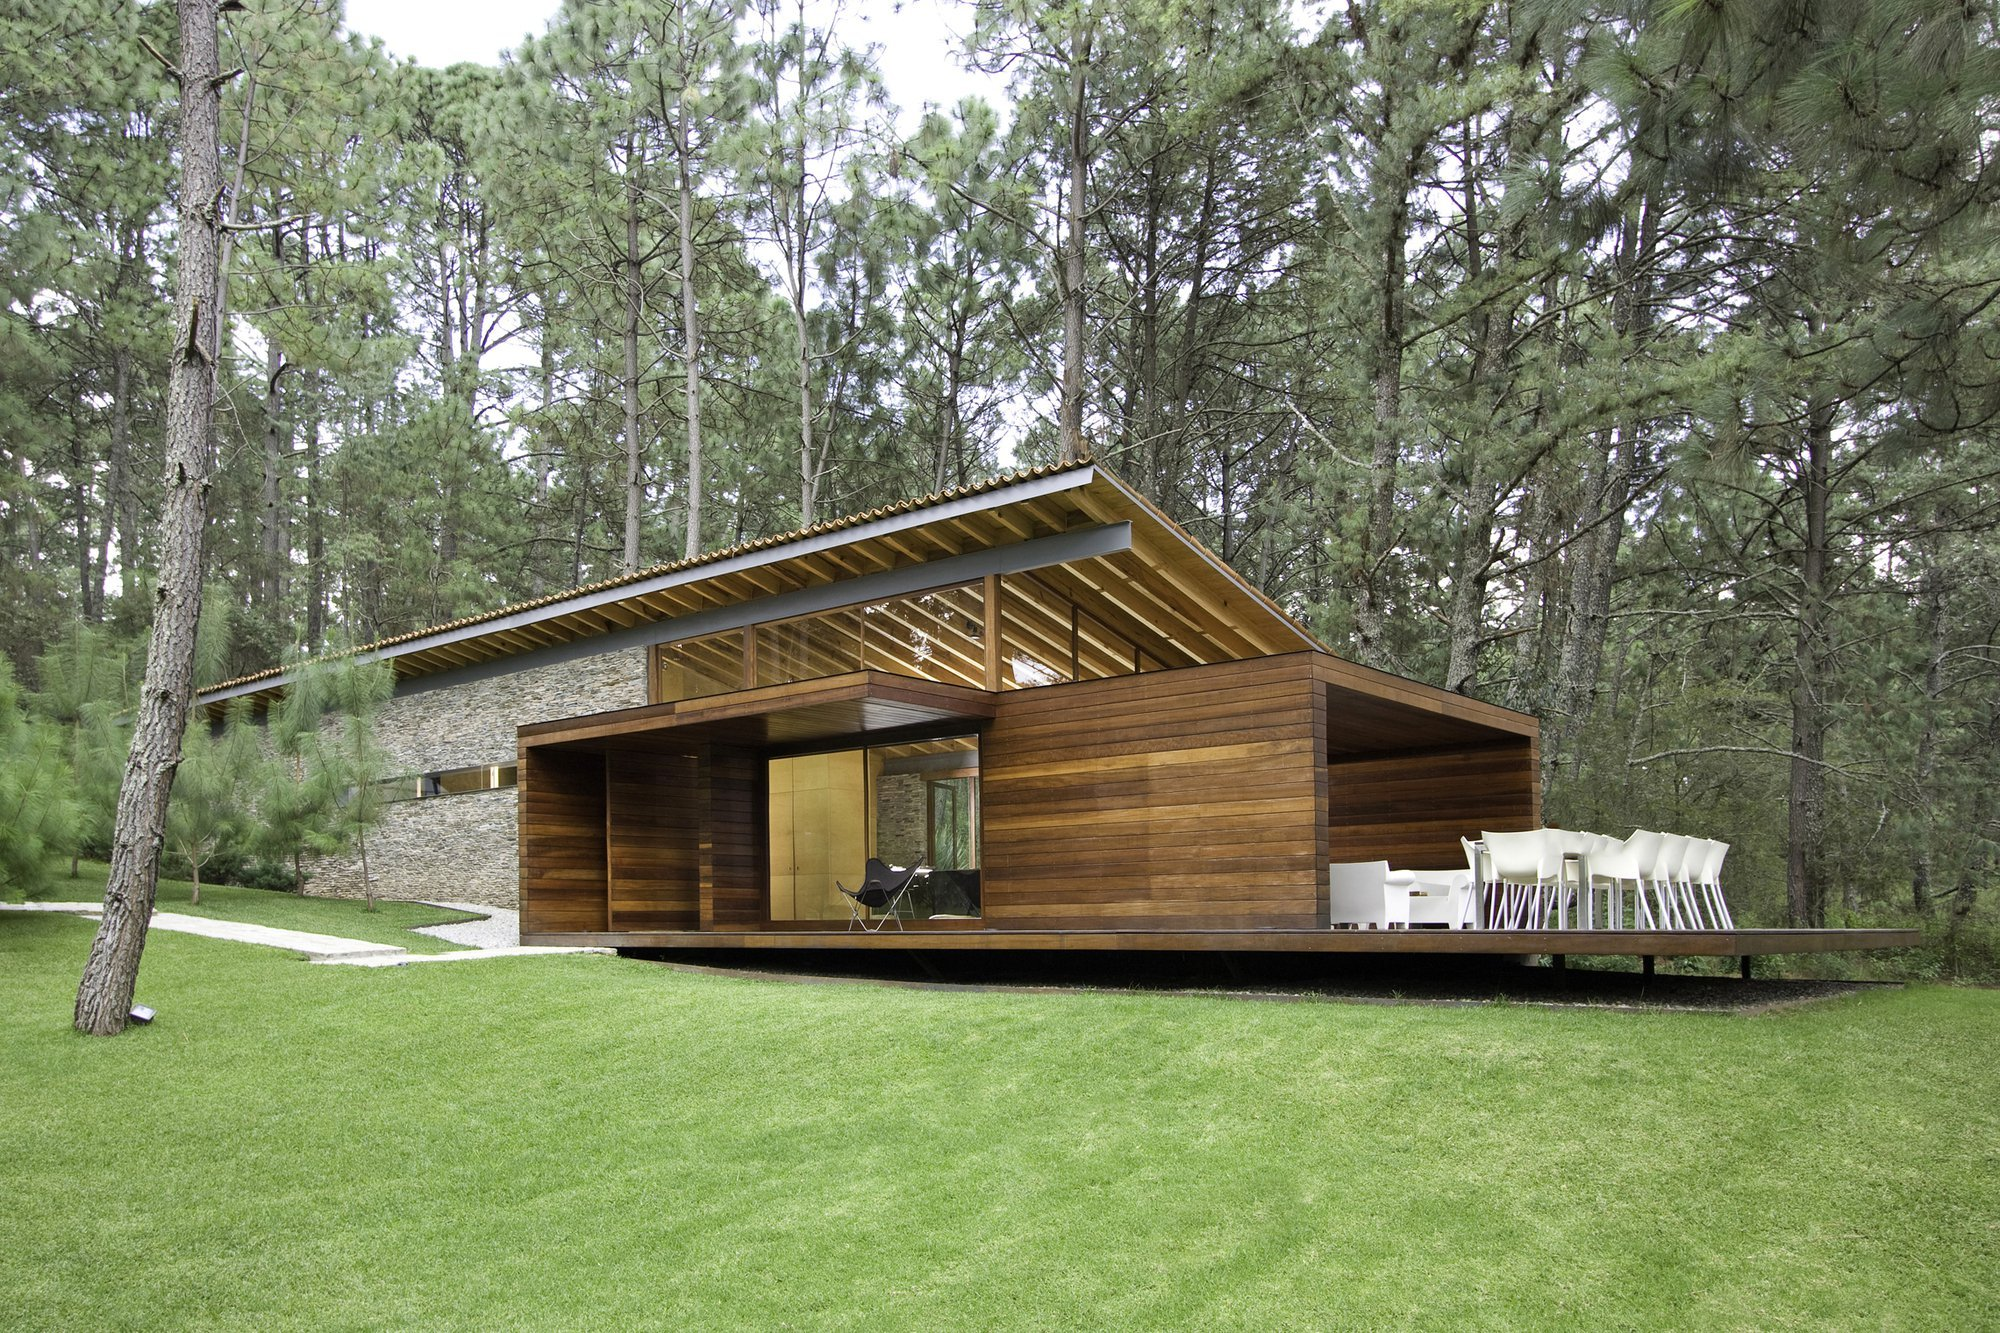 Galer a de casa ro tapalpa el as rizo arquitectos 2 for Arquitectos para casas